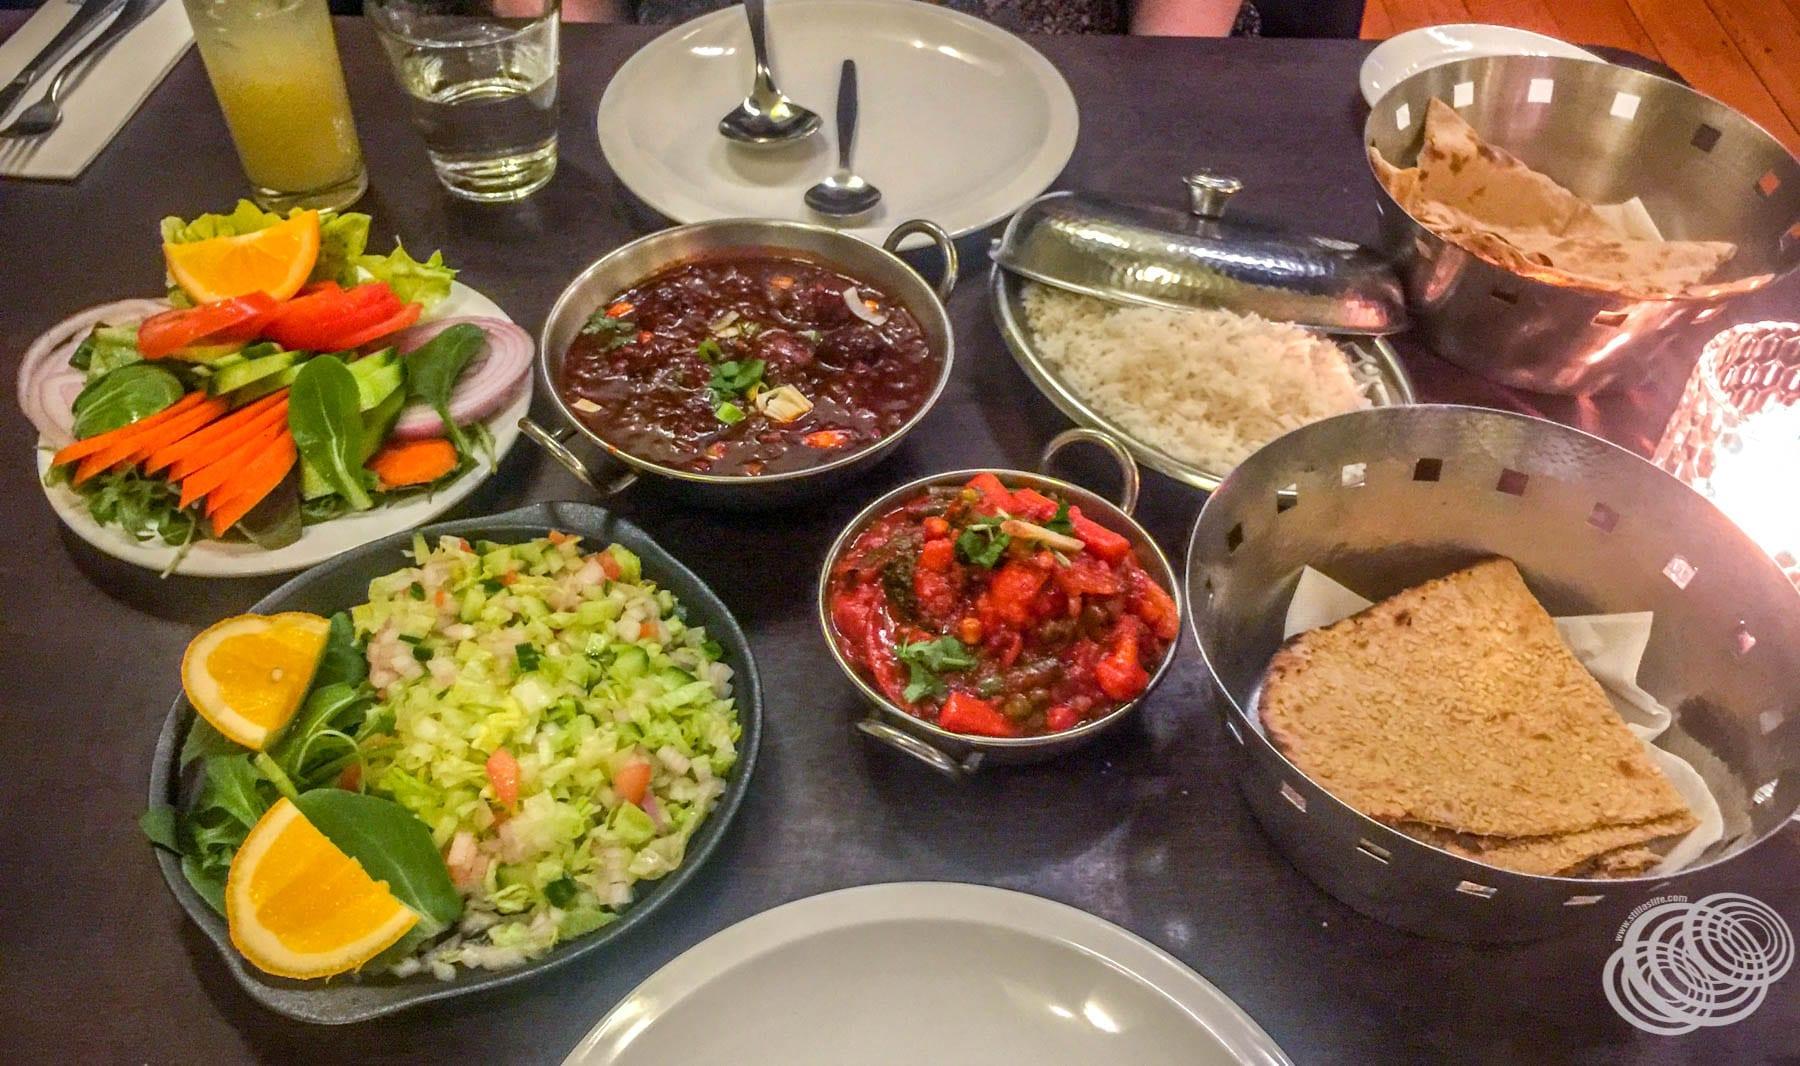 Vegan Dinner at Indigo Napier